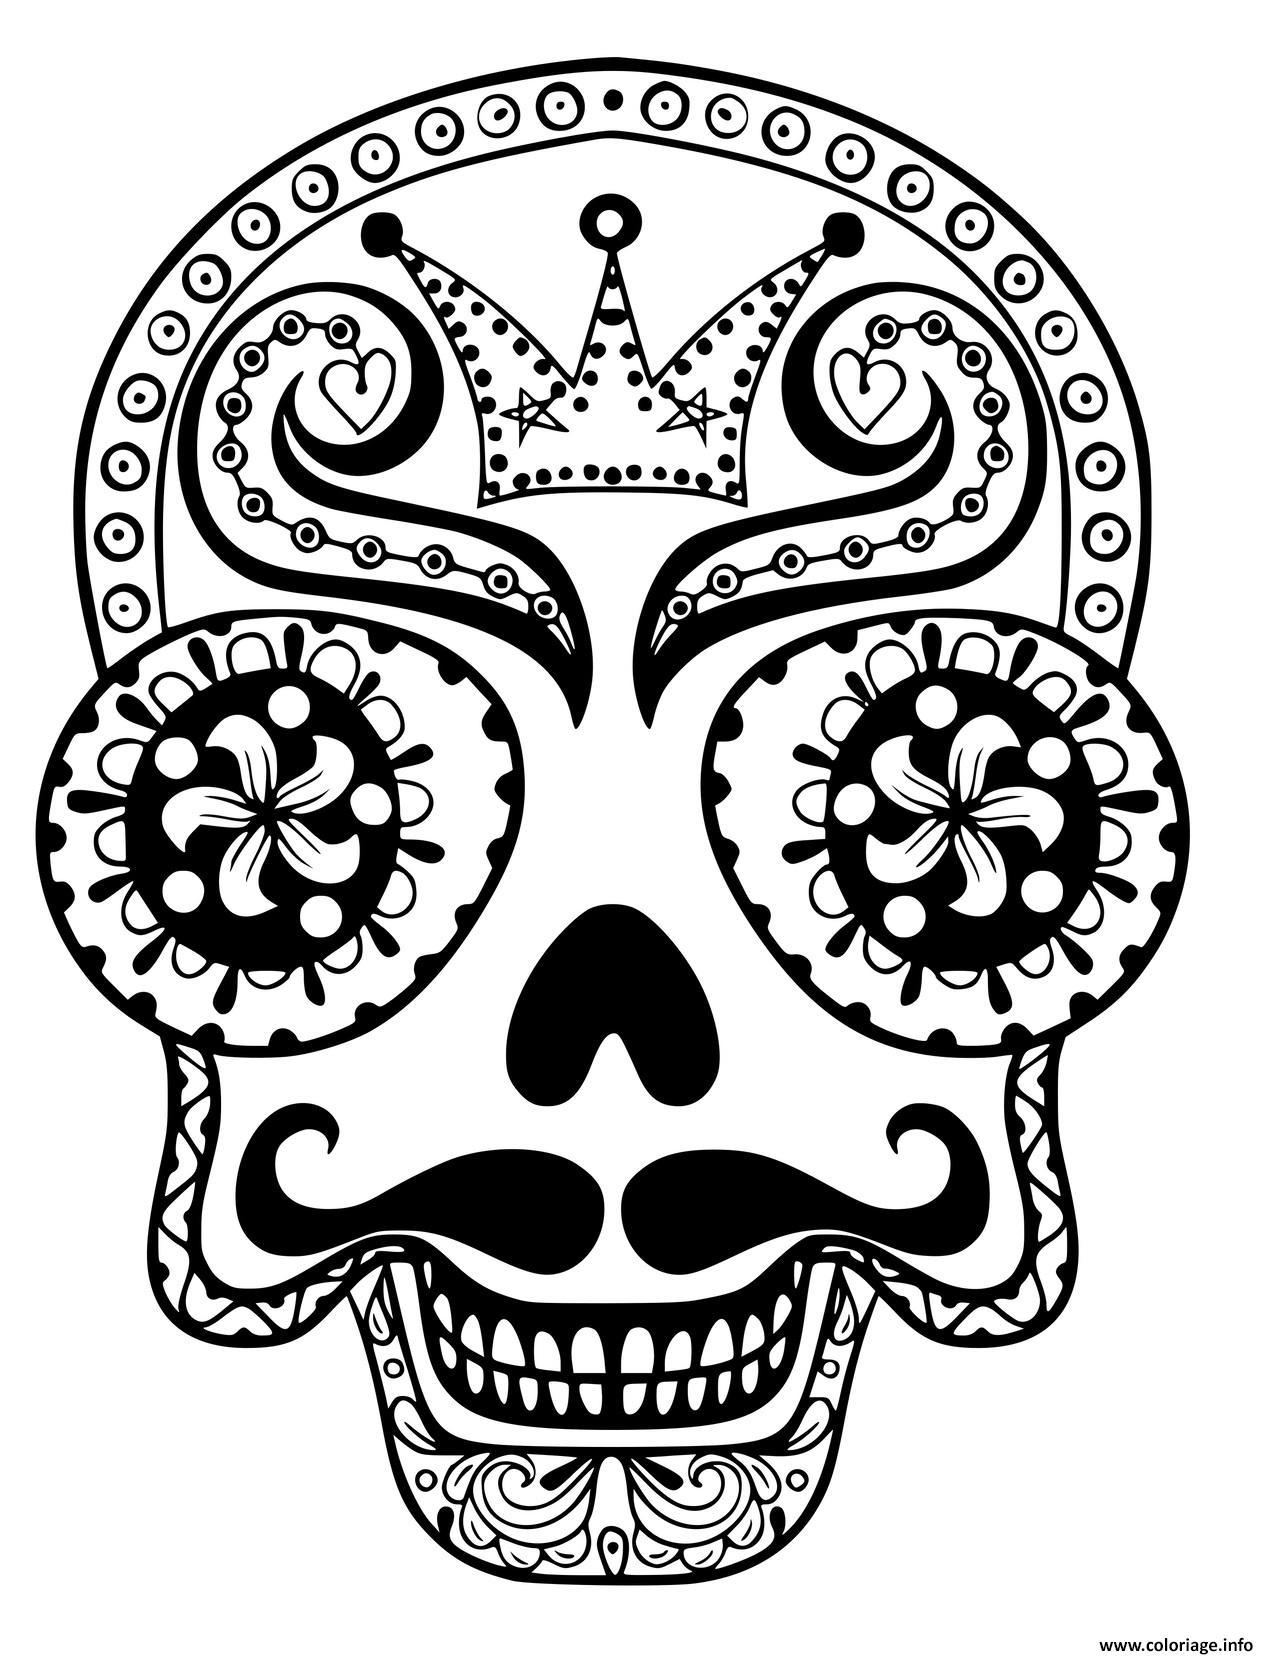 Dessin dead skull adulte Coloriage Gratuit à Imprimer